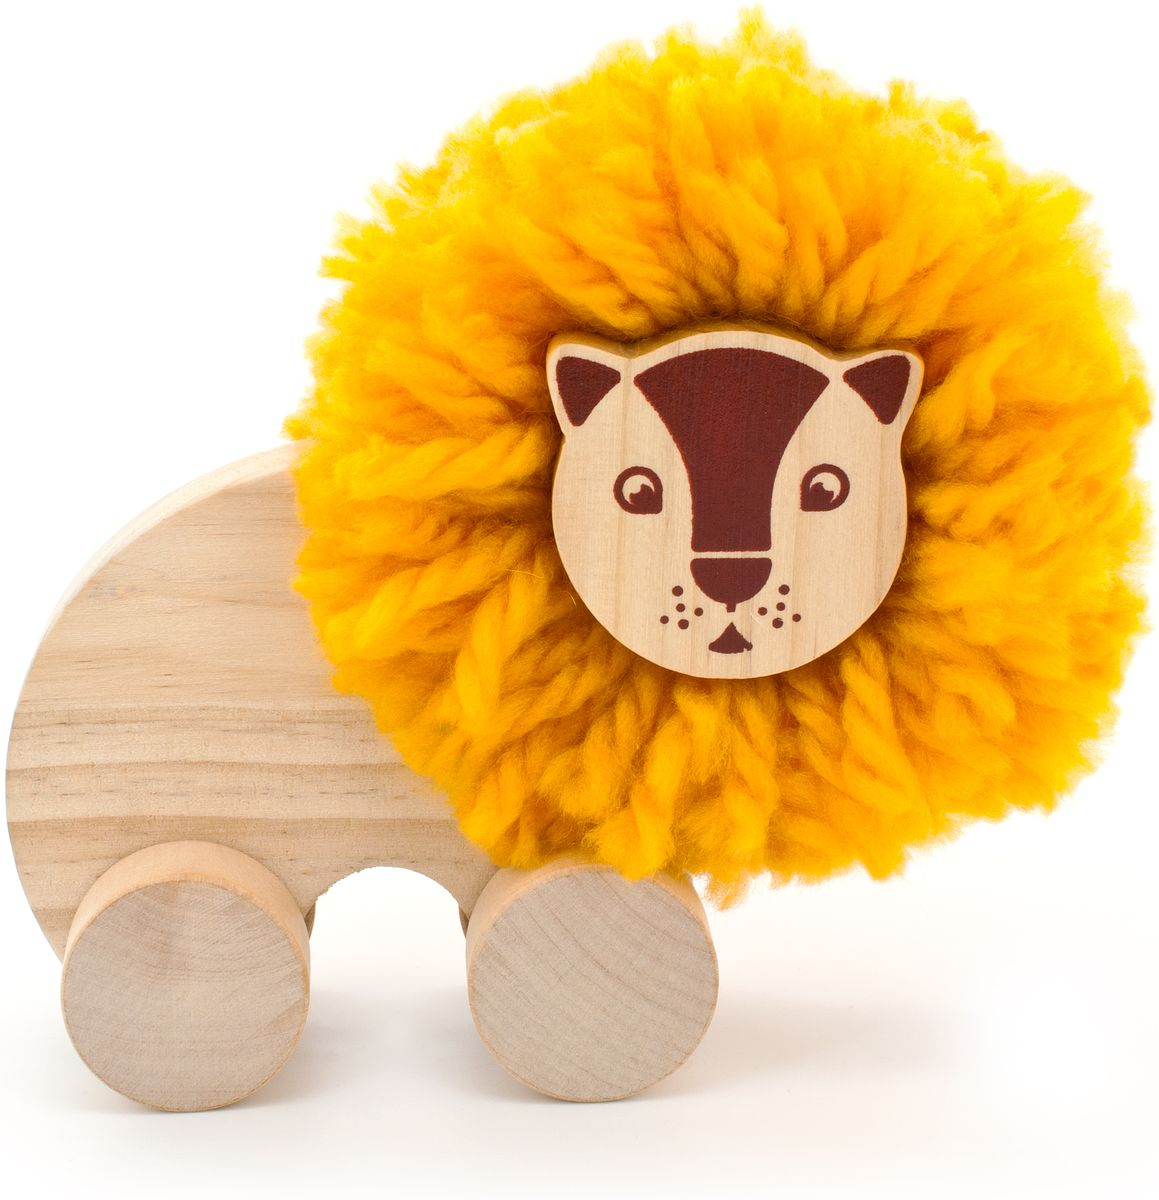 Мир деревянных игрушек Игрушка-каталка Помпон Лев игрушка мир деревянных игрушек куб сафари д373